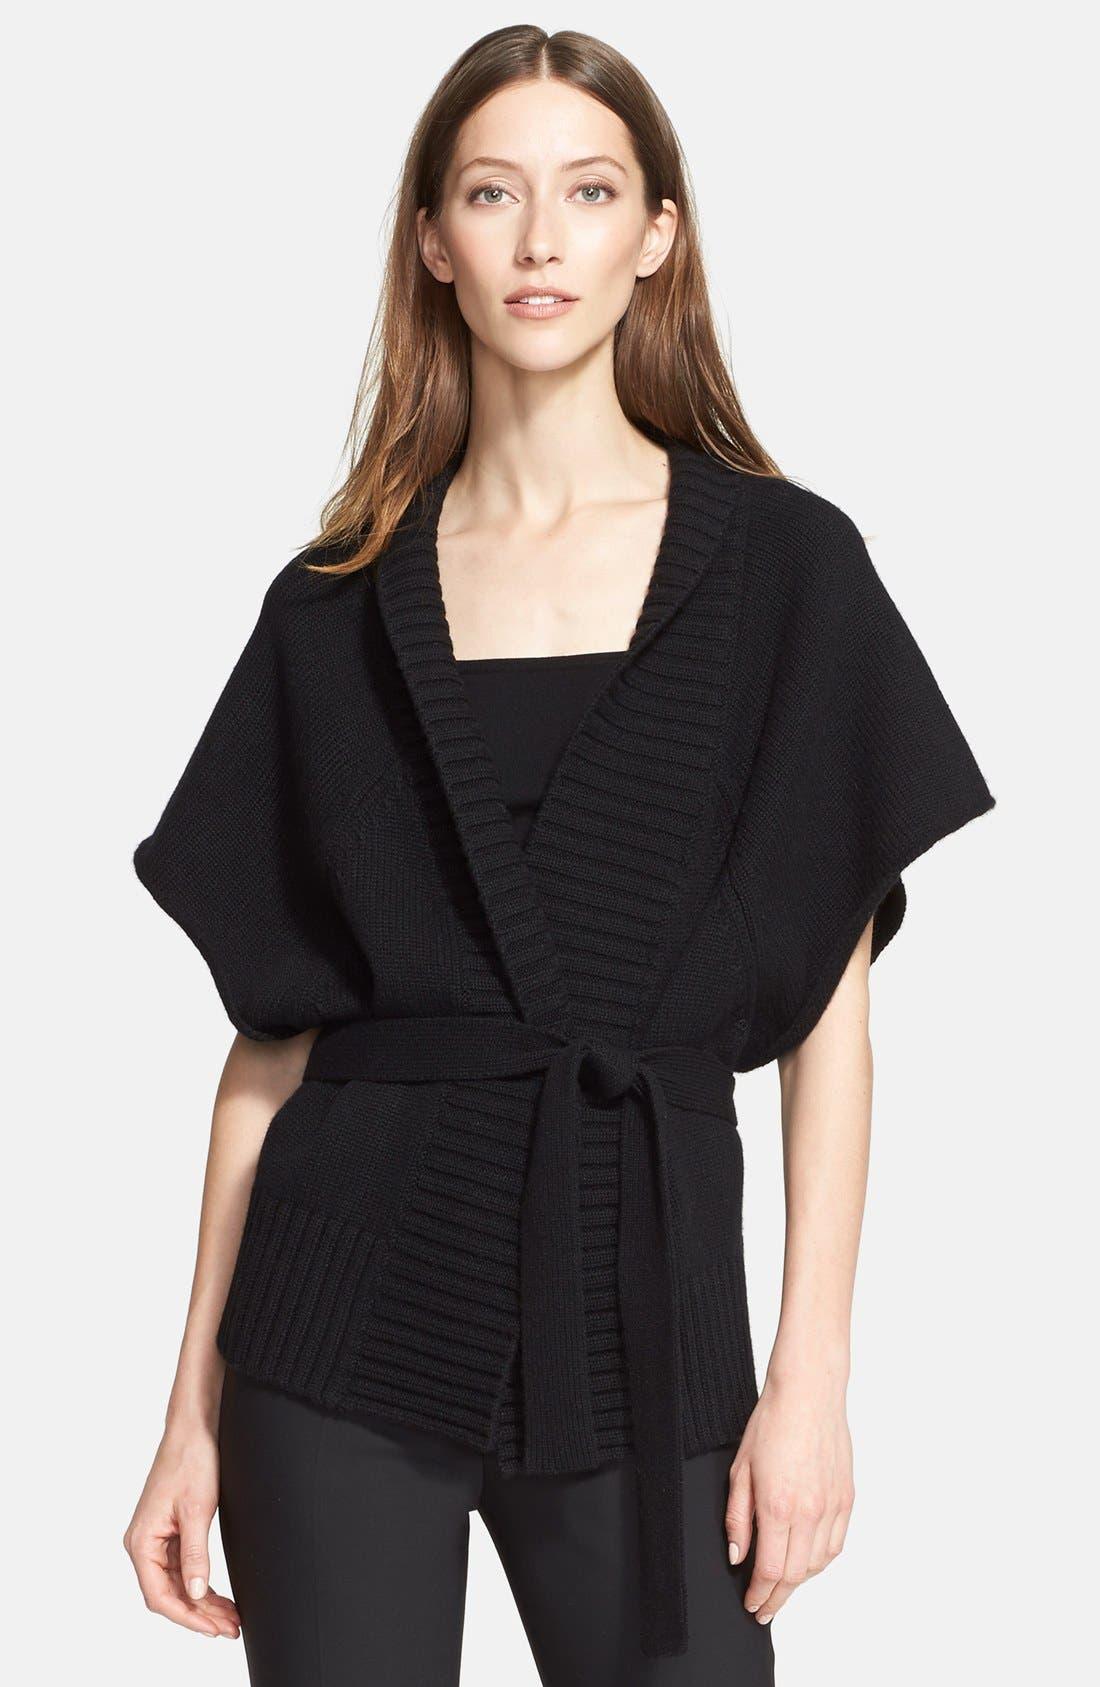 Michael Kors Rib Trim Cashmere Kimono Cardigan | Nordstrom